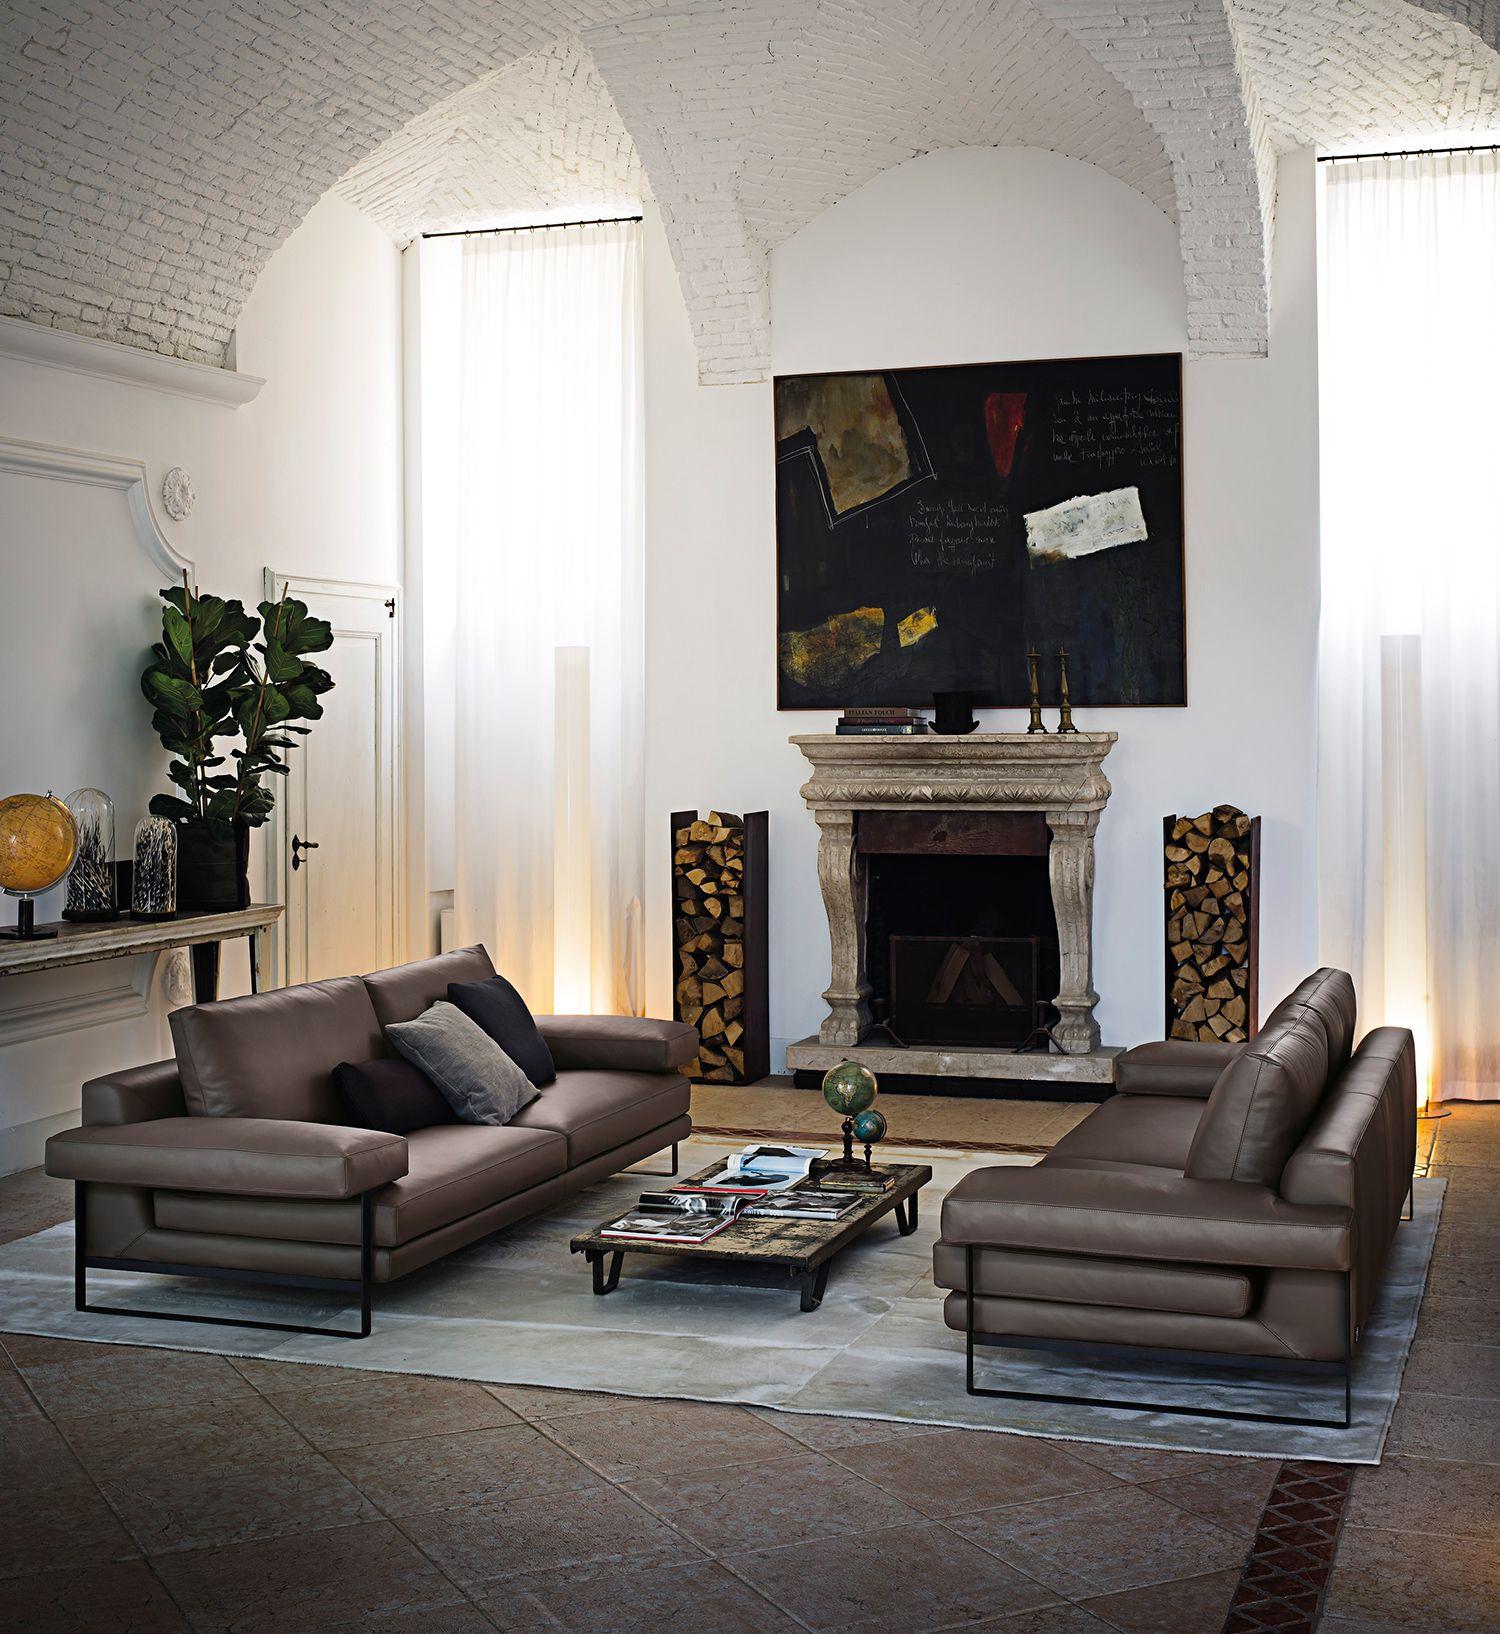 Ego Design Depot Furniture Furniture Miami Showroom Modern Sofa Living Room Contemporary Living Room Design Mid Century Modern Living Room